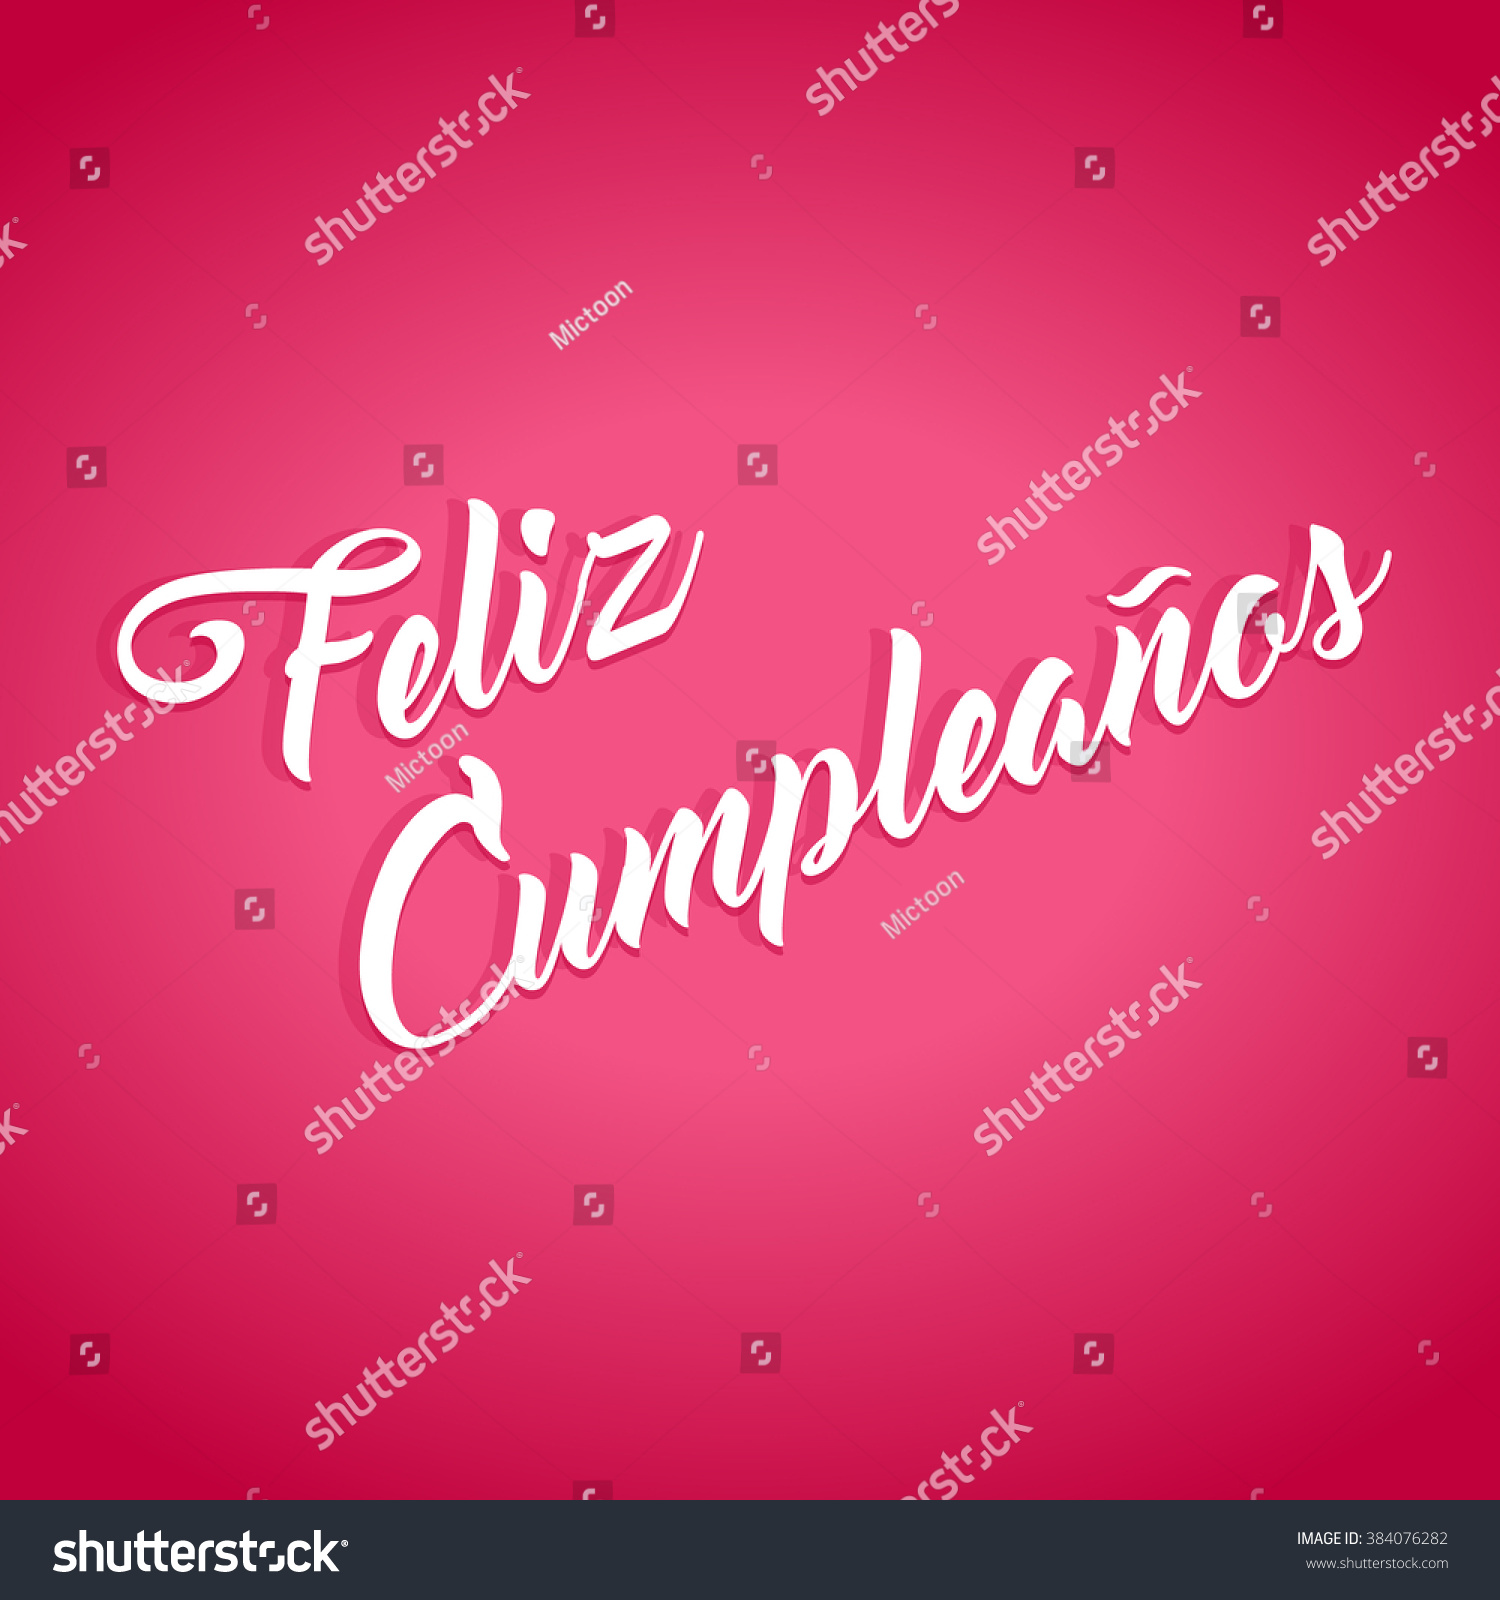 Feliz Cumpleanos Happy Birthday Hand Lettering Stock Vector